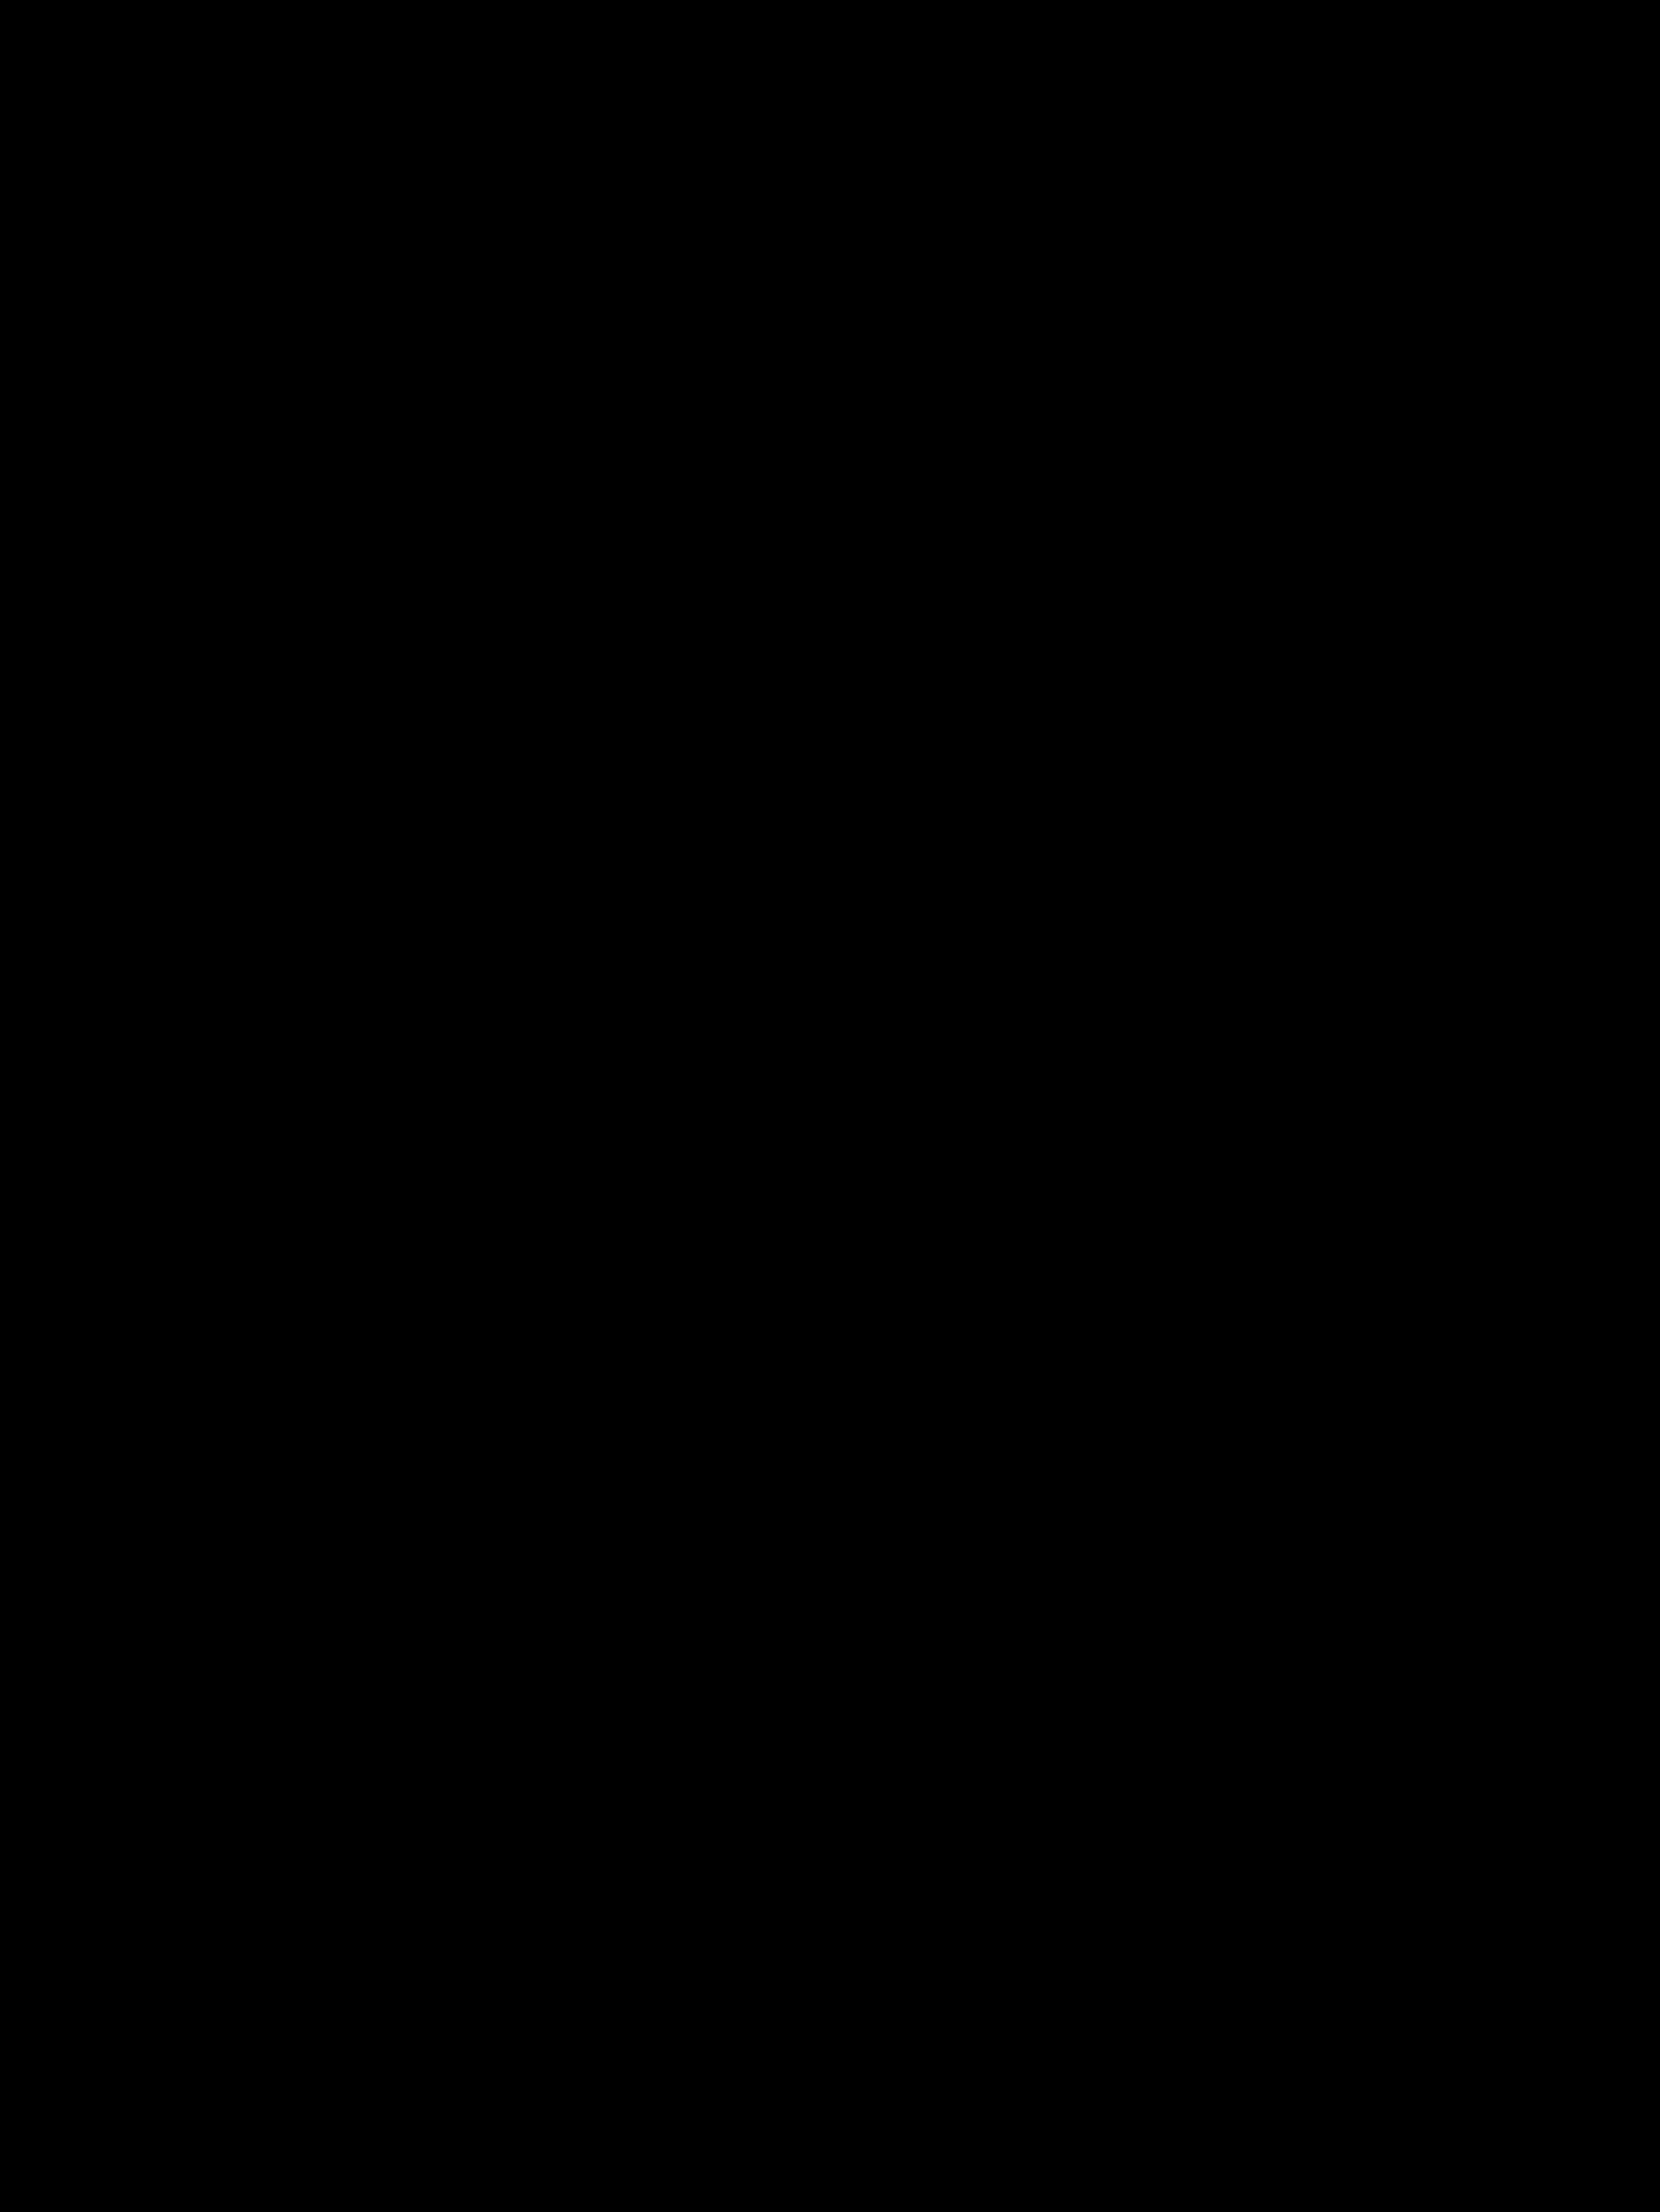 picture transparent download Silhouette clip art at. Pelican clipart.